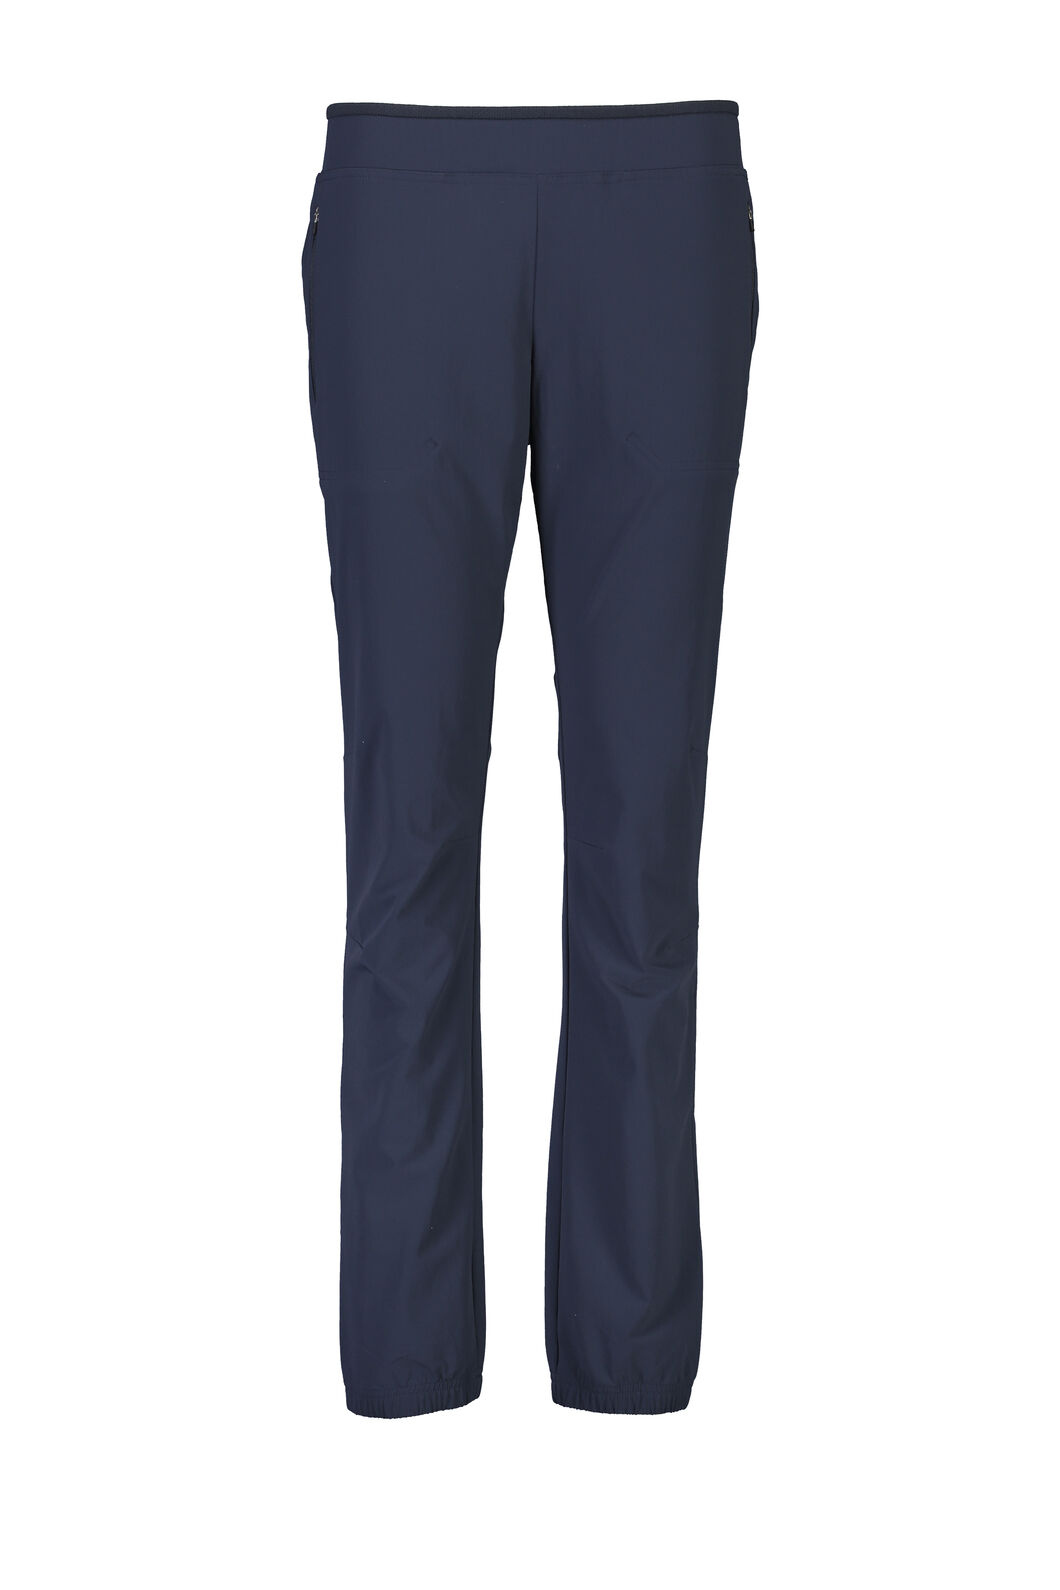 Macpac Hike Tight Pertex Equilibrium® Softshell Pants - Women's, Carbon, hi-res